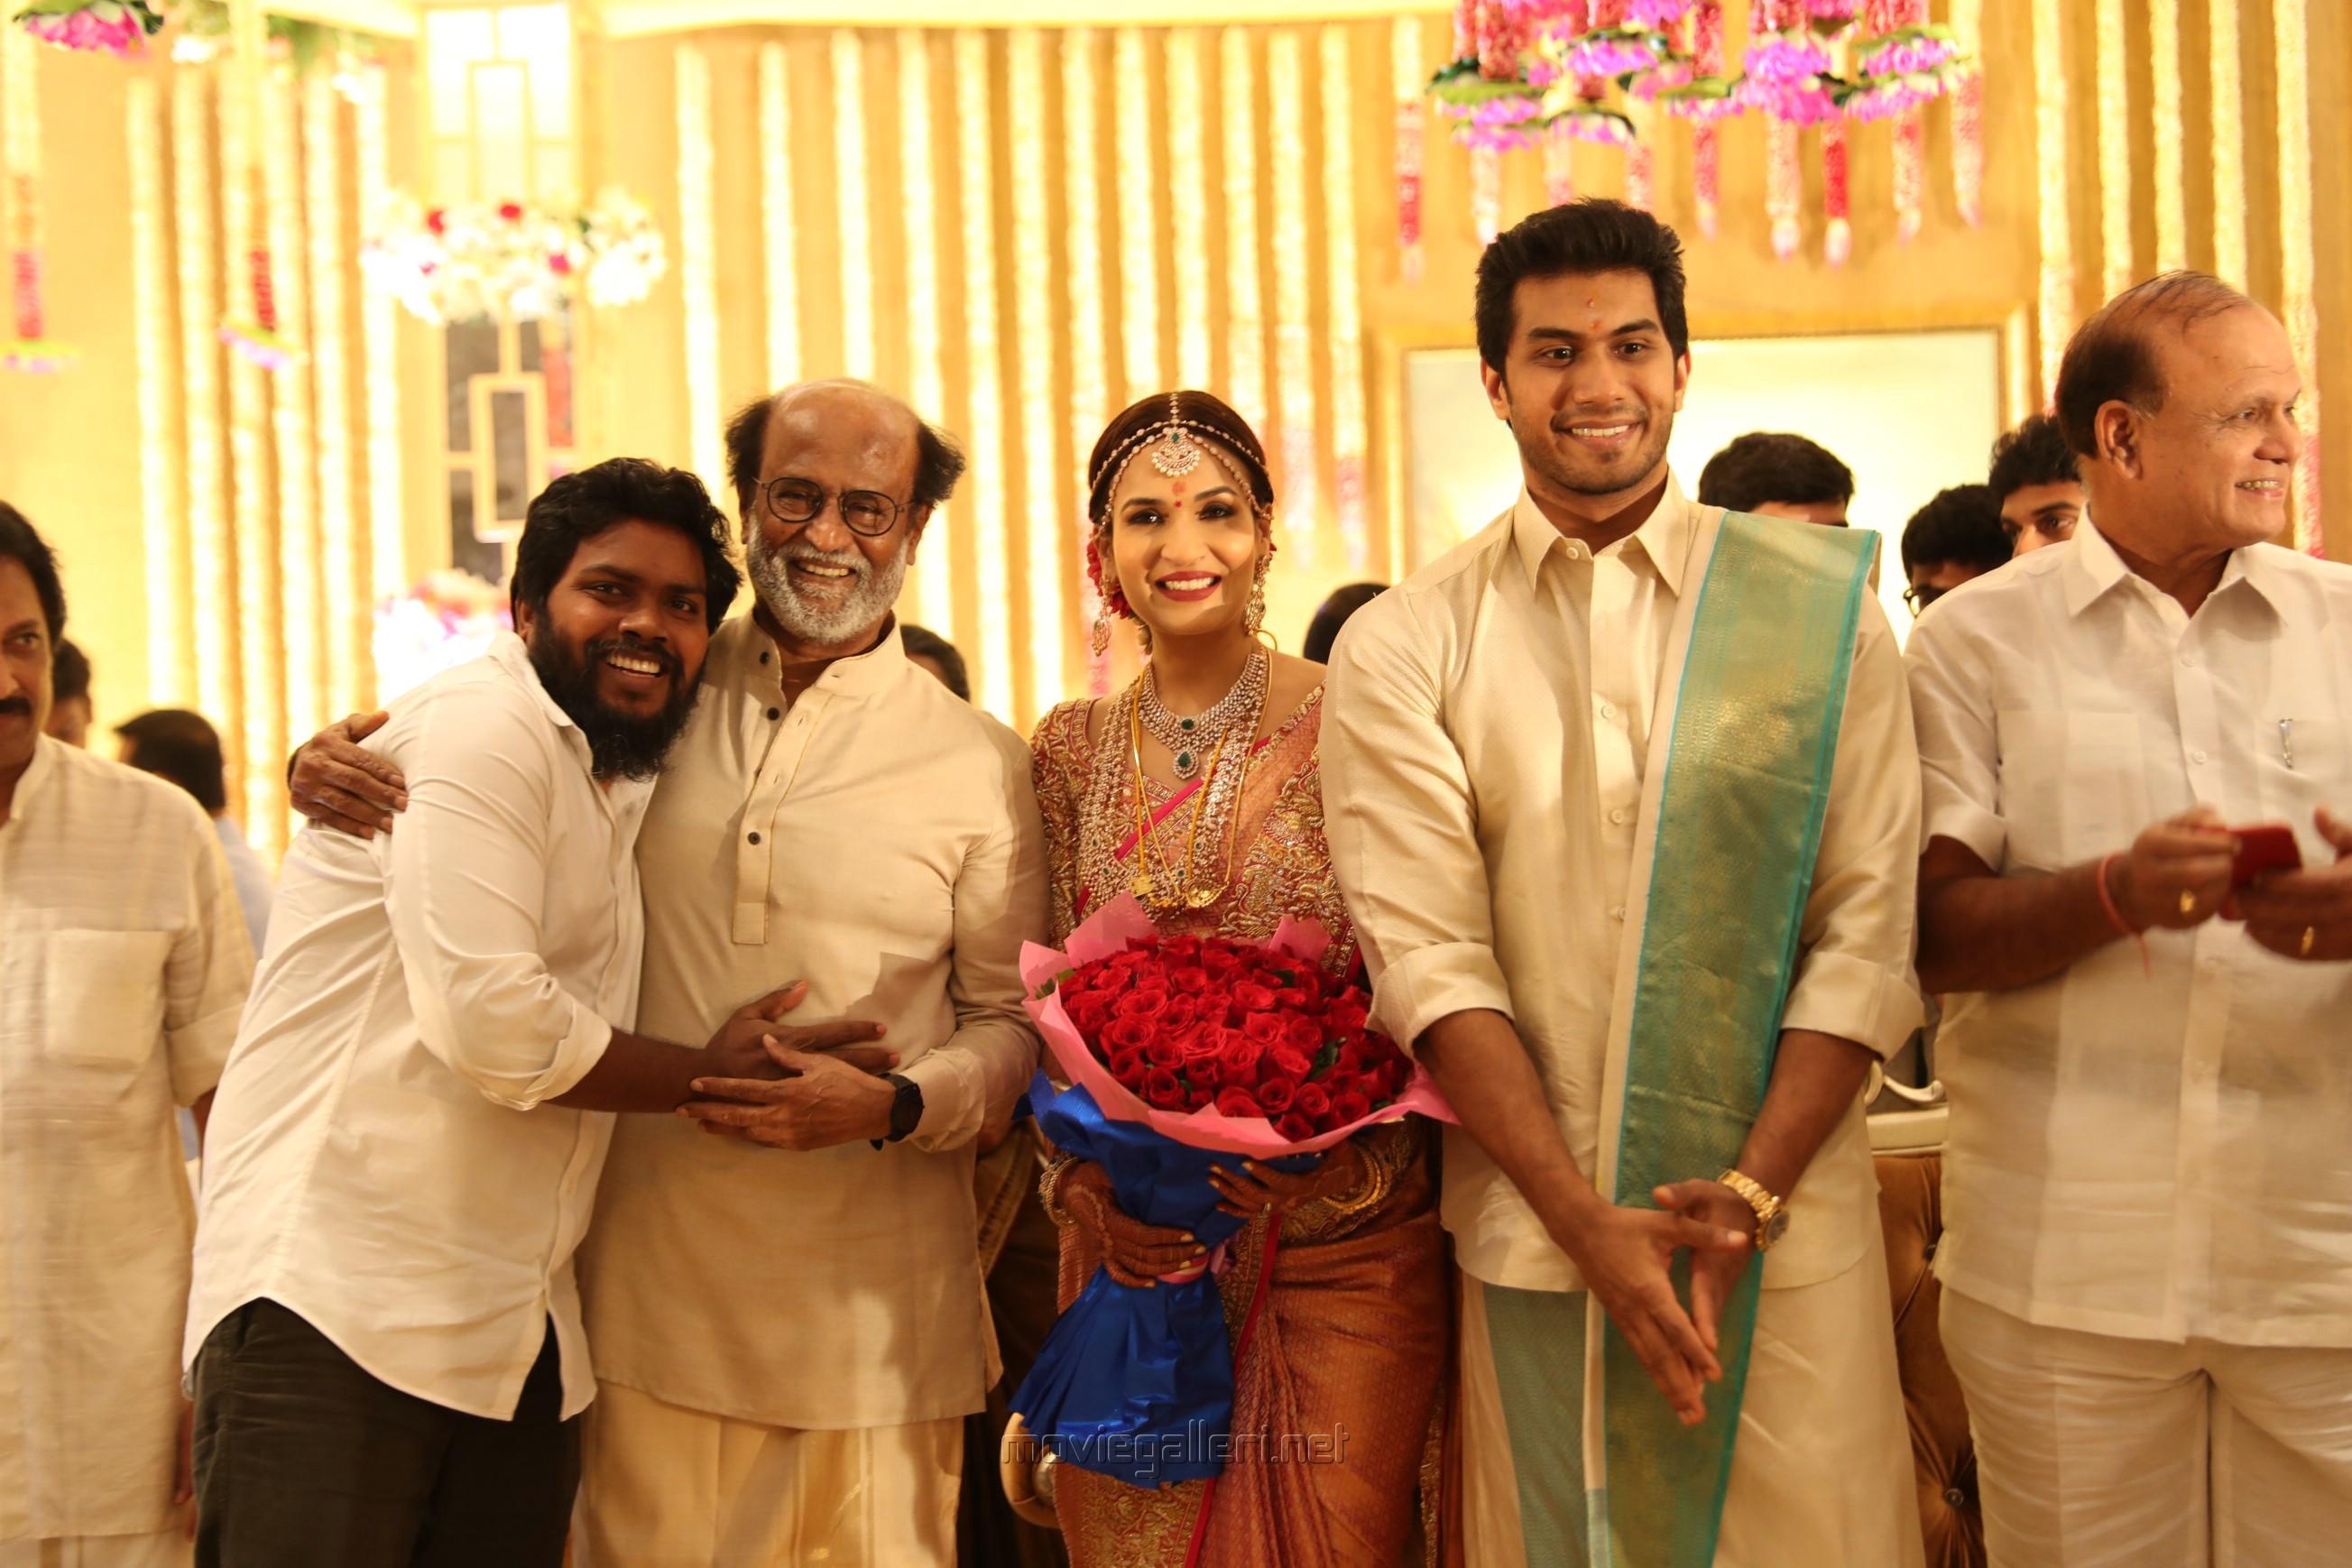 Pa Ranjith @ Vishagan Soundarya Rajinikanth Marriage Photos HD